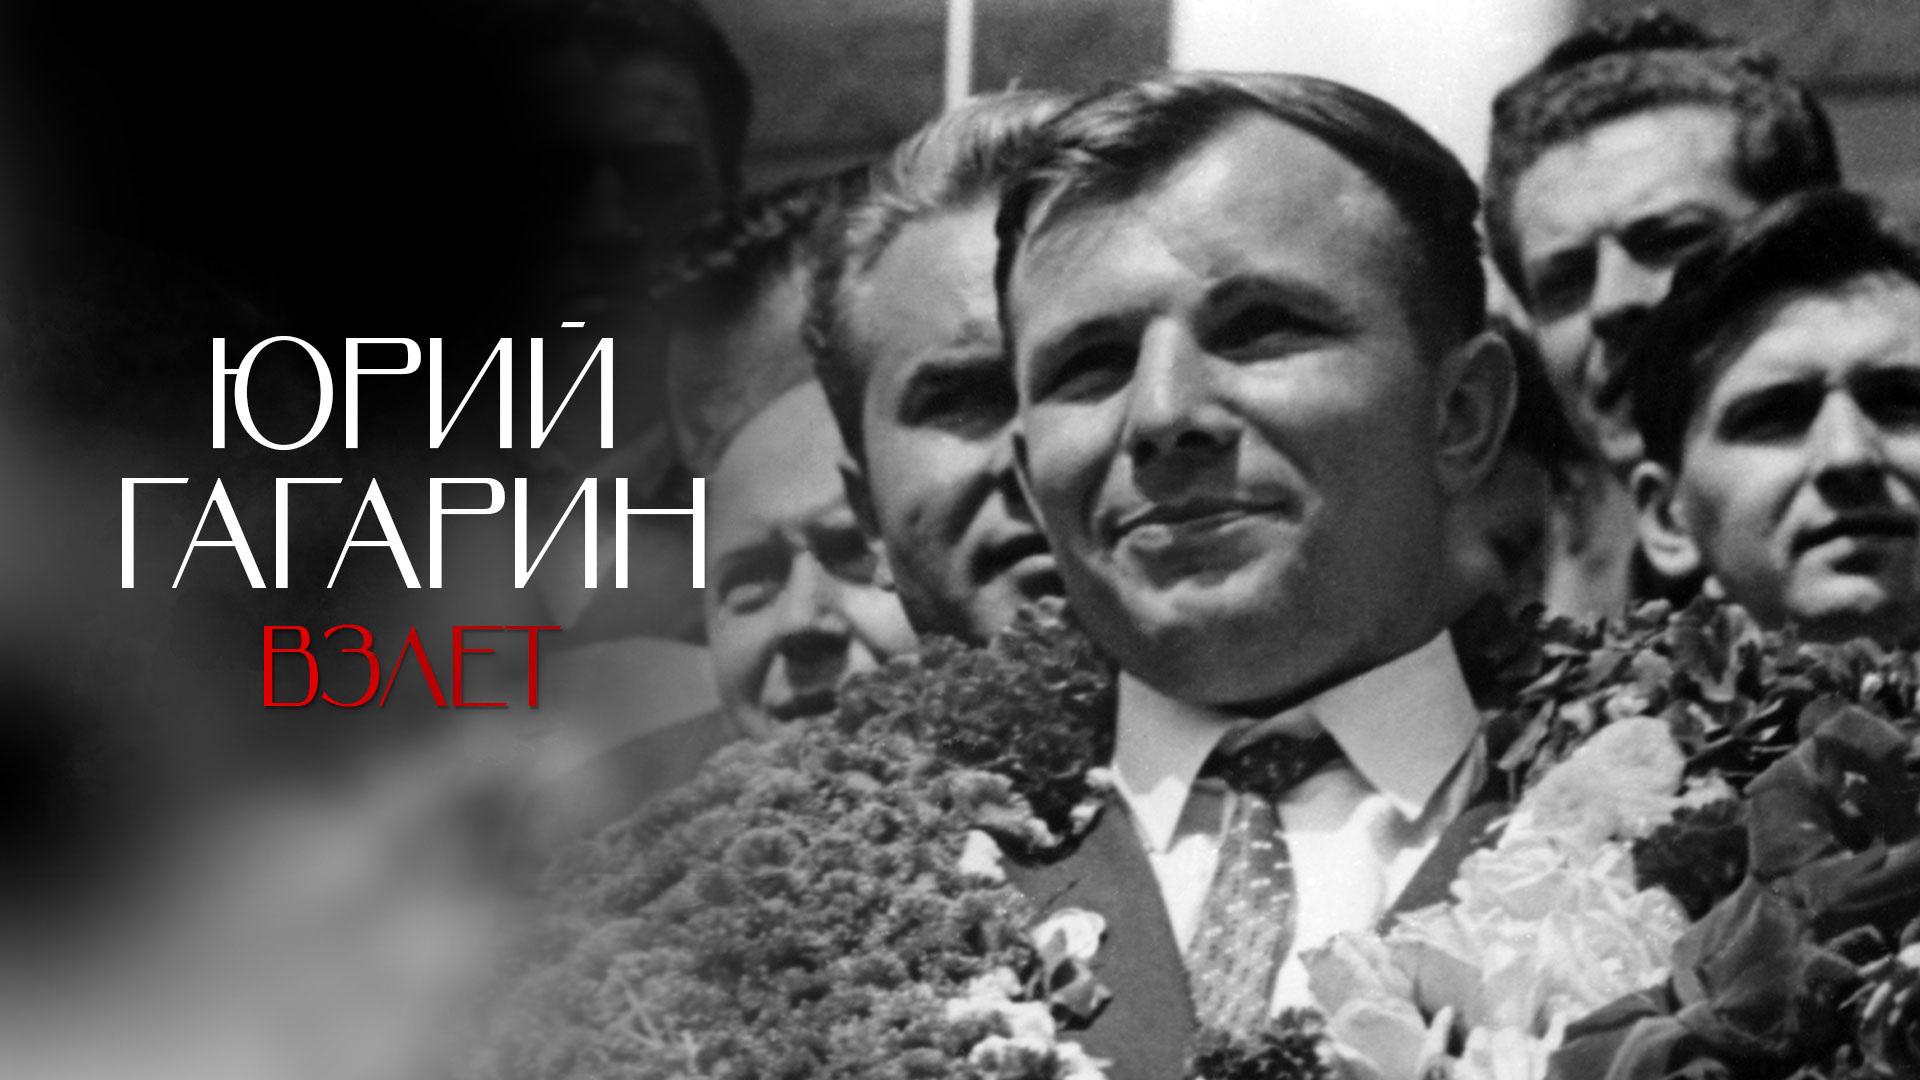 Юрий Гагарин. Взлет